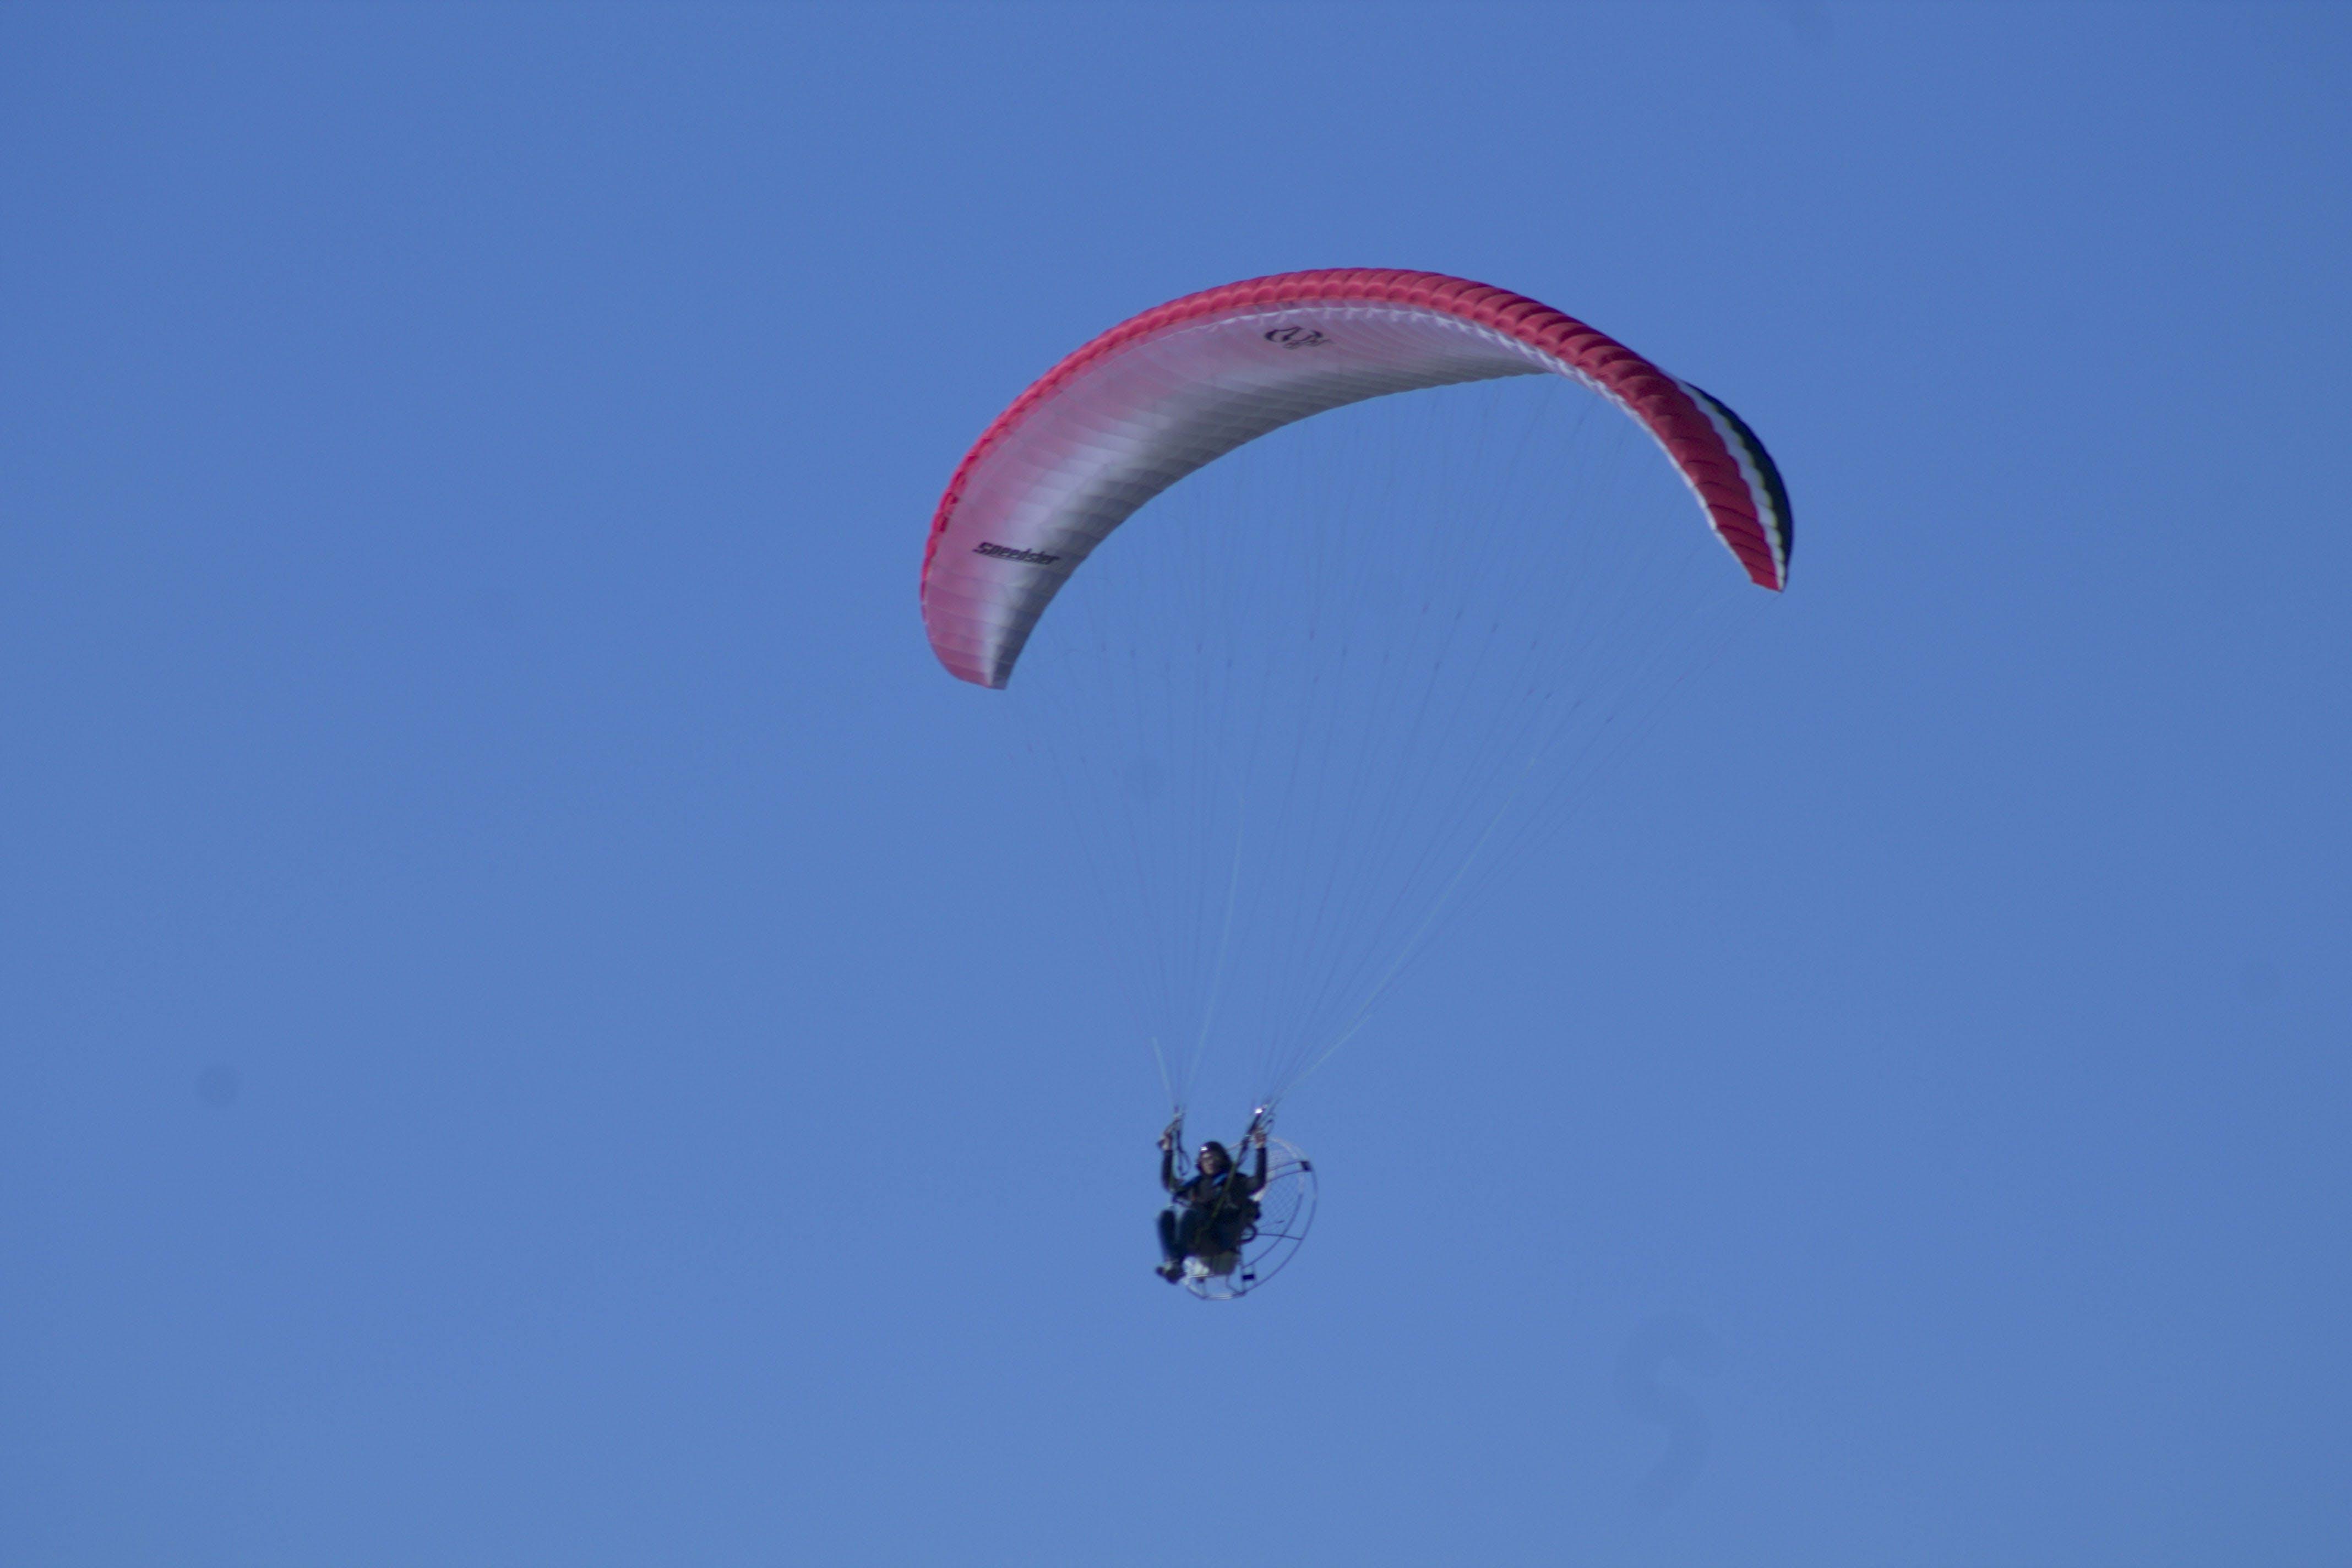 Free stock photo of flight, sky, man, blue sky